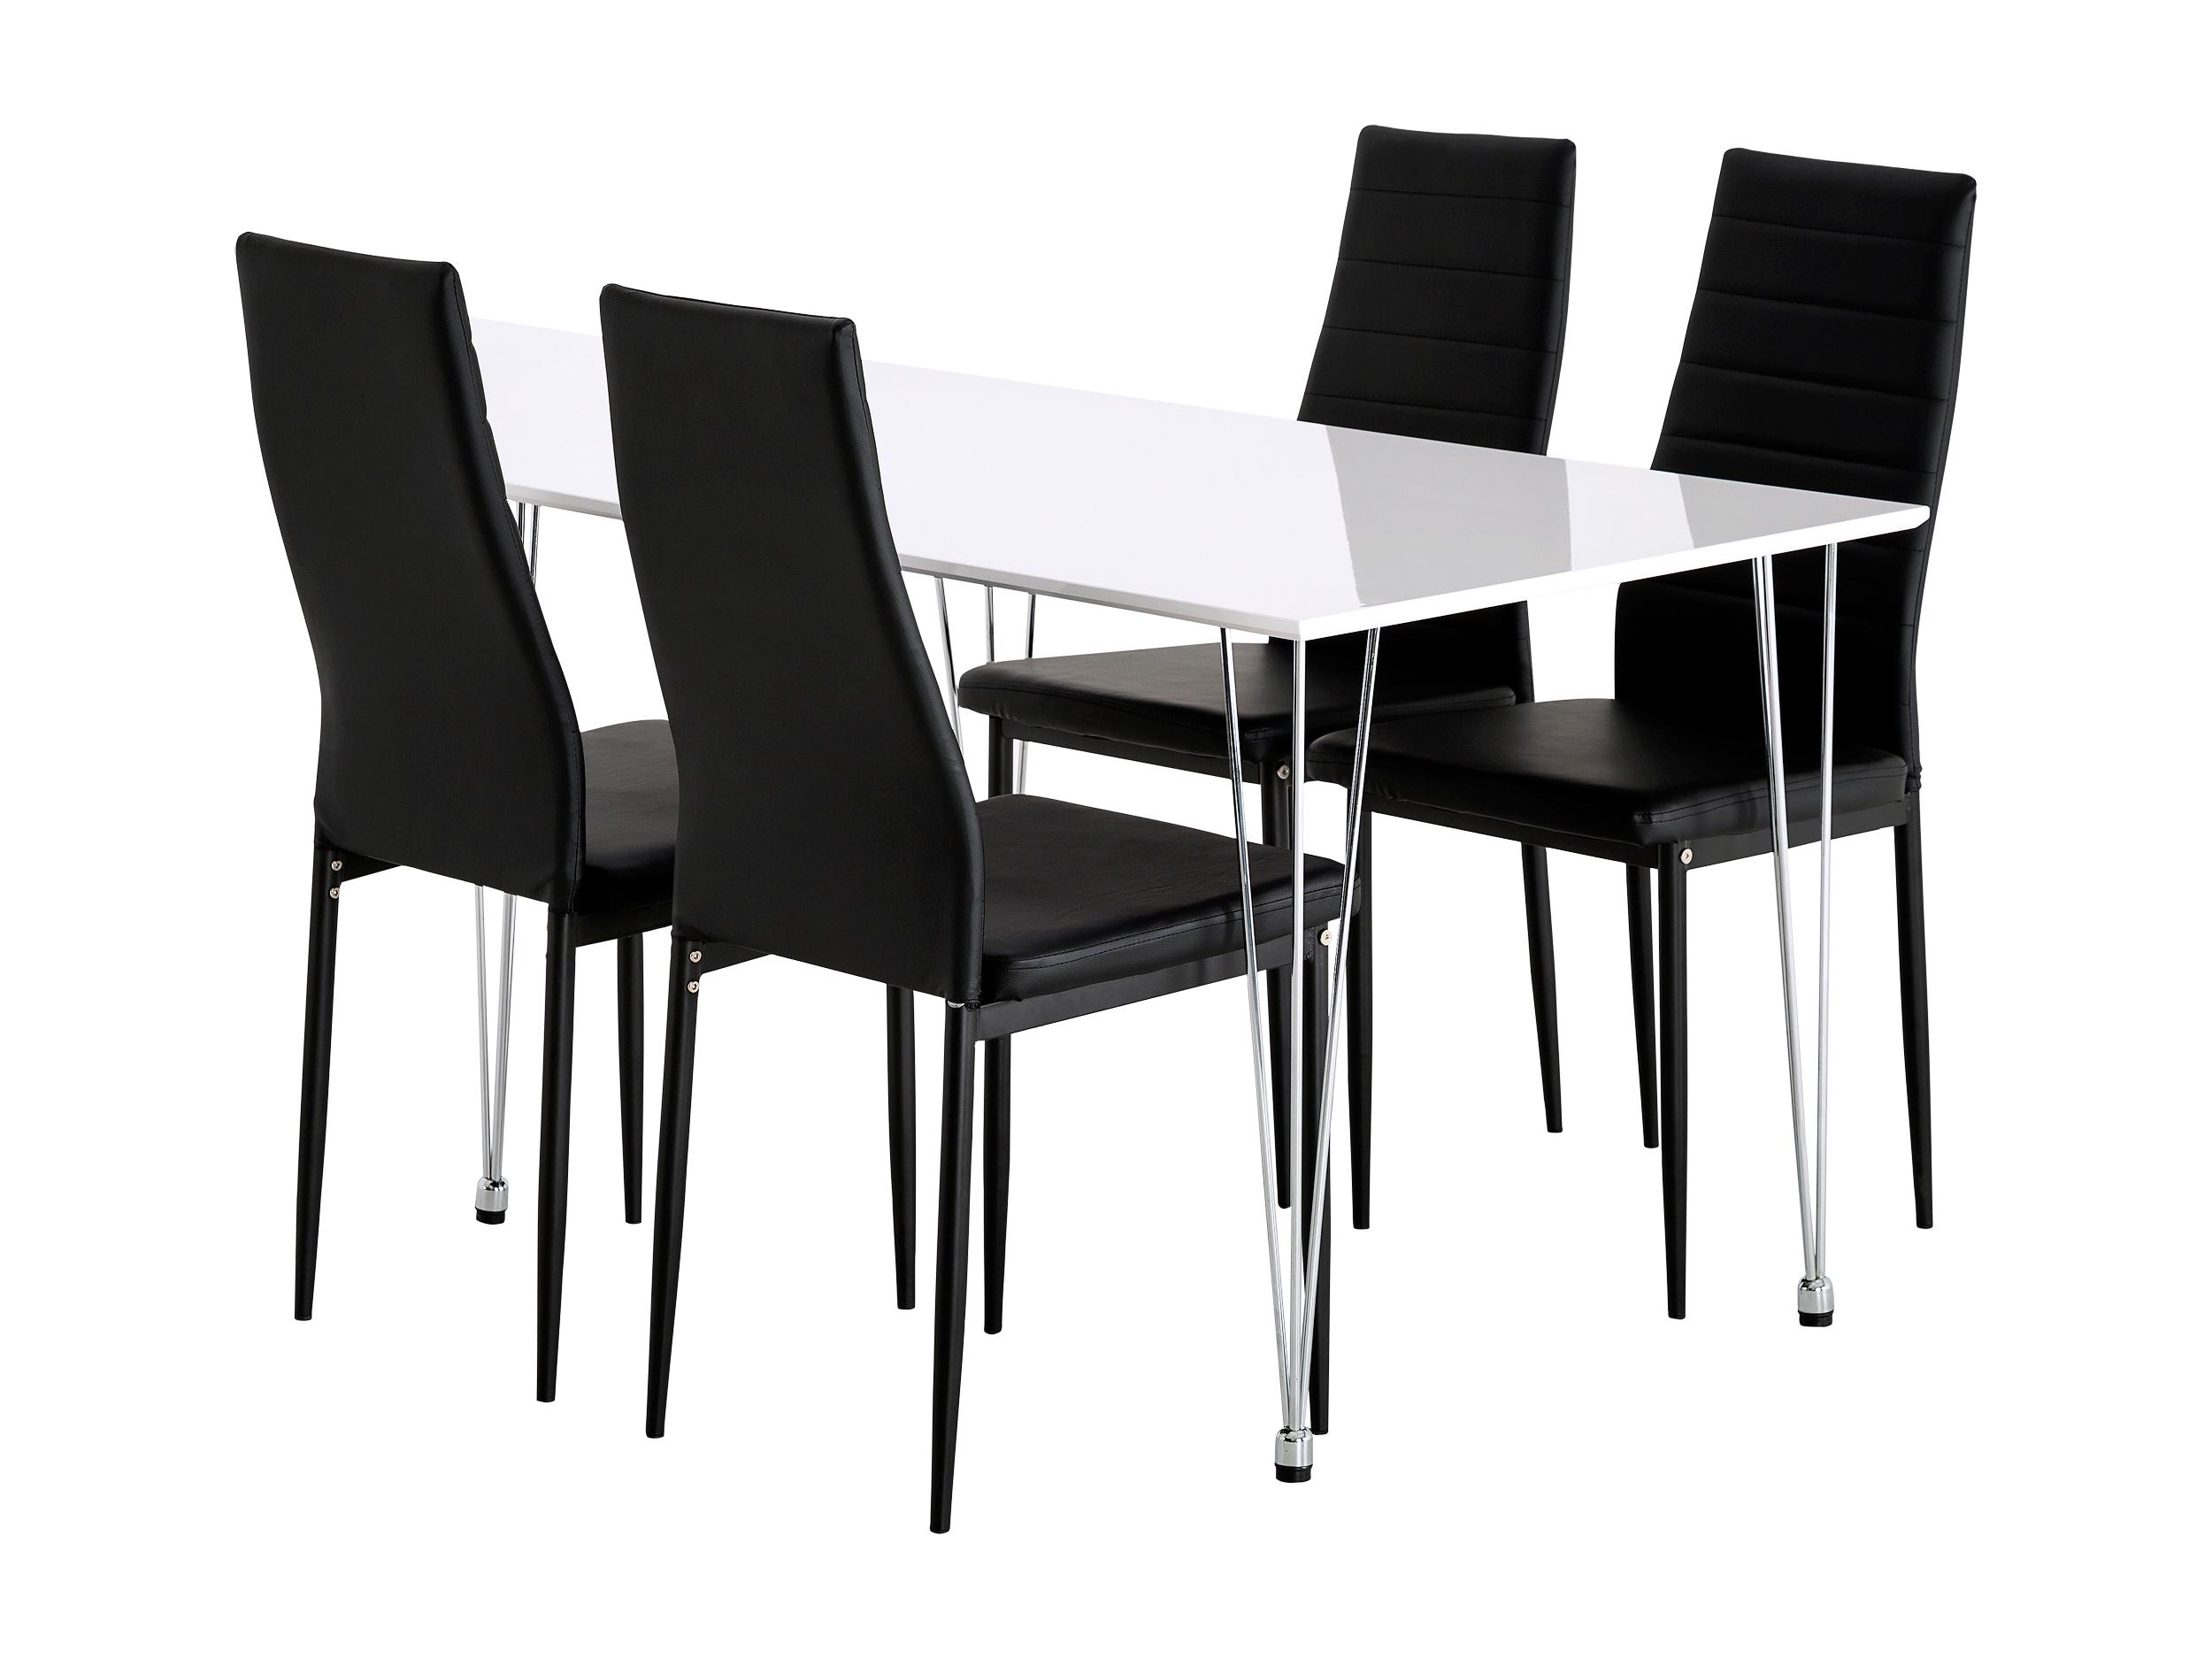 Koksbord 4 Stolar U2013 Möbel För Kök, Sovrum